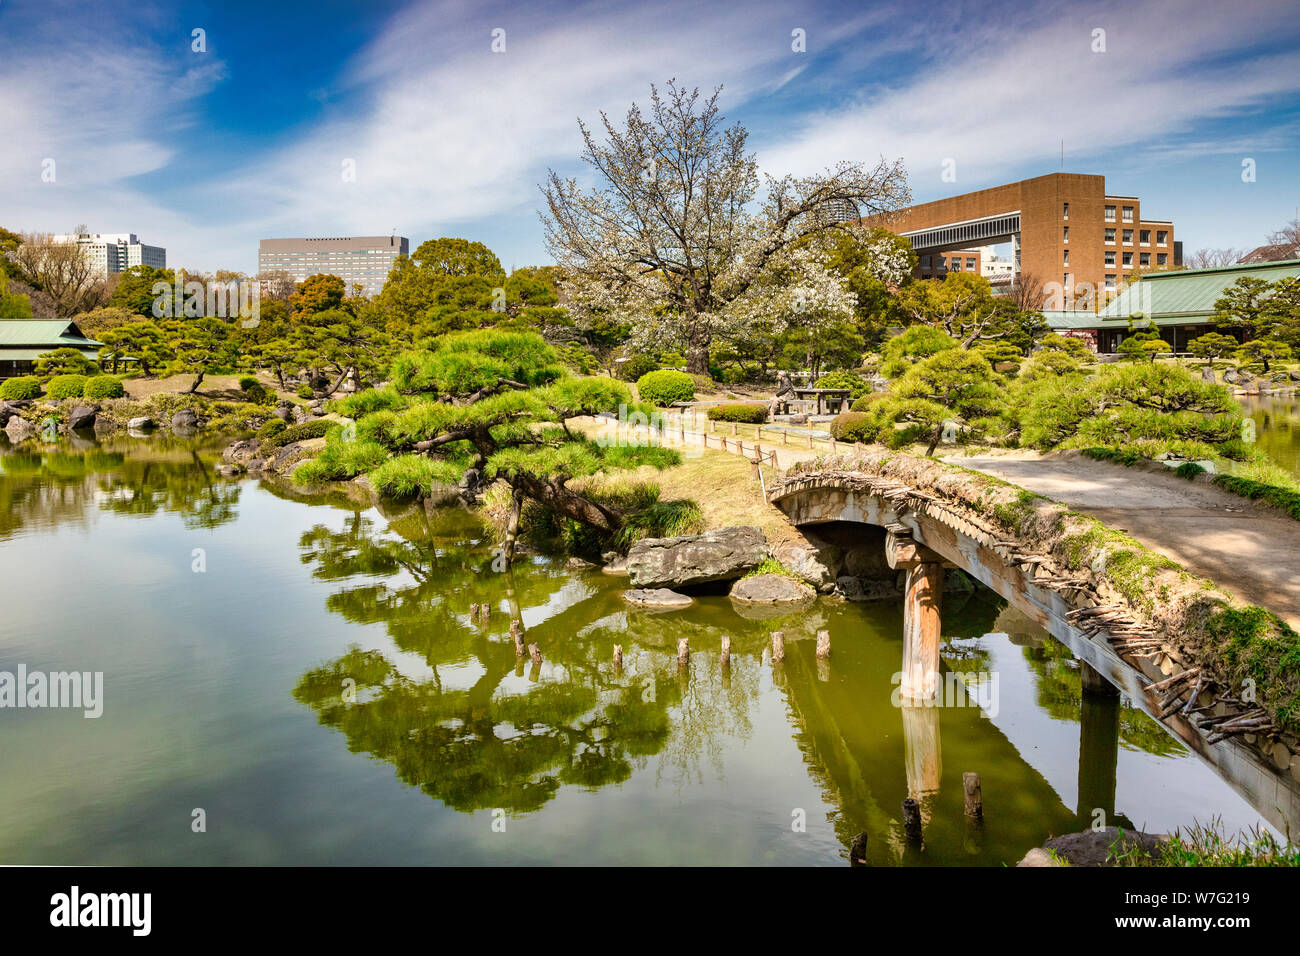 5 April 2019: Tokyo, Japan - Pond and bridge in Kiyosumi Garden, a traditional style landscape garden in Tokyo. Stock Photo